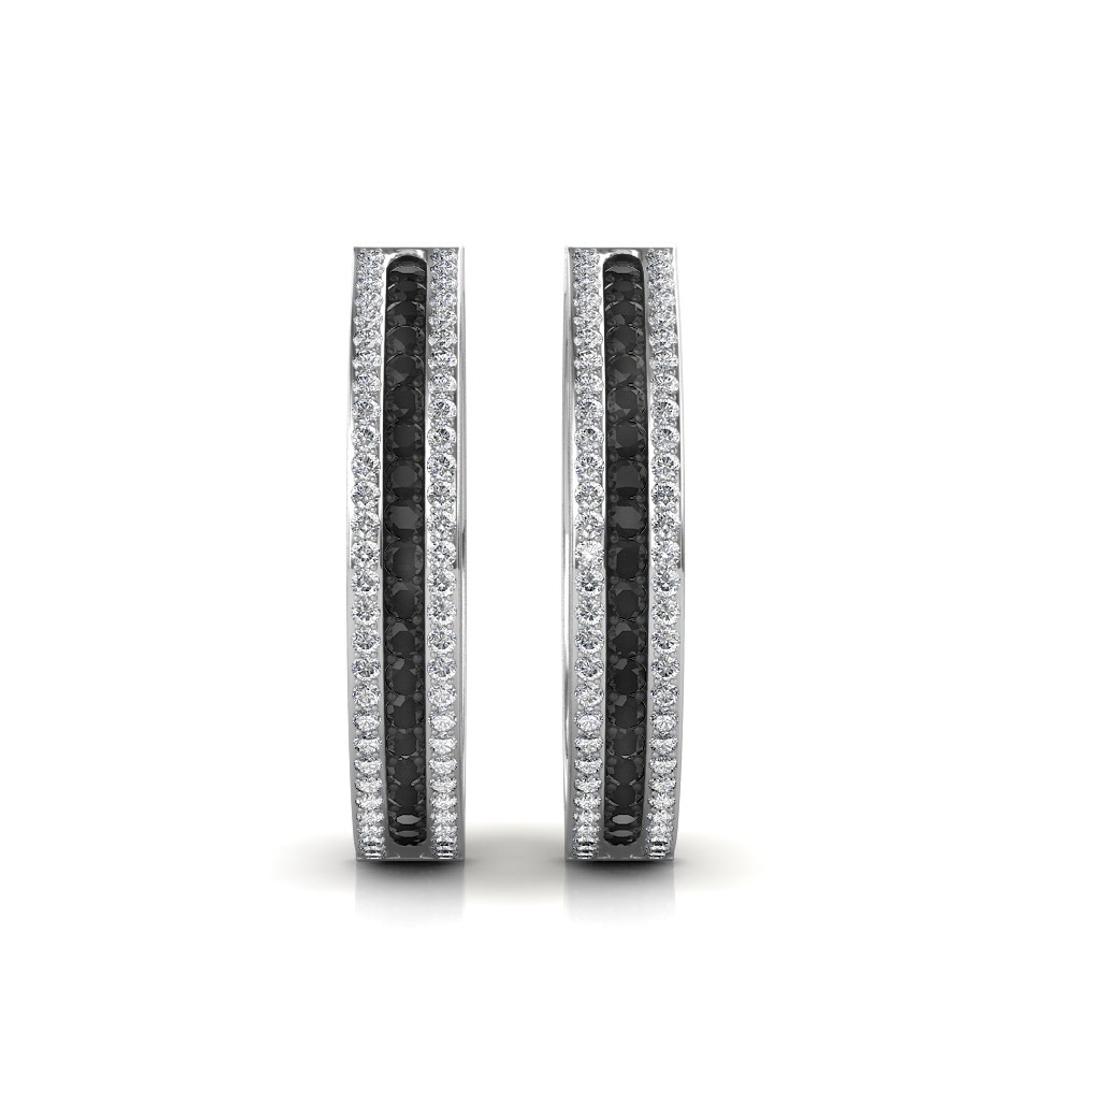 Sarvada Jewels' The Anna Black Diamond Hoop Earrings